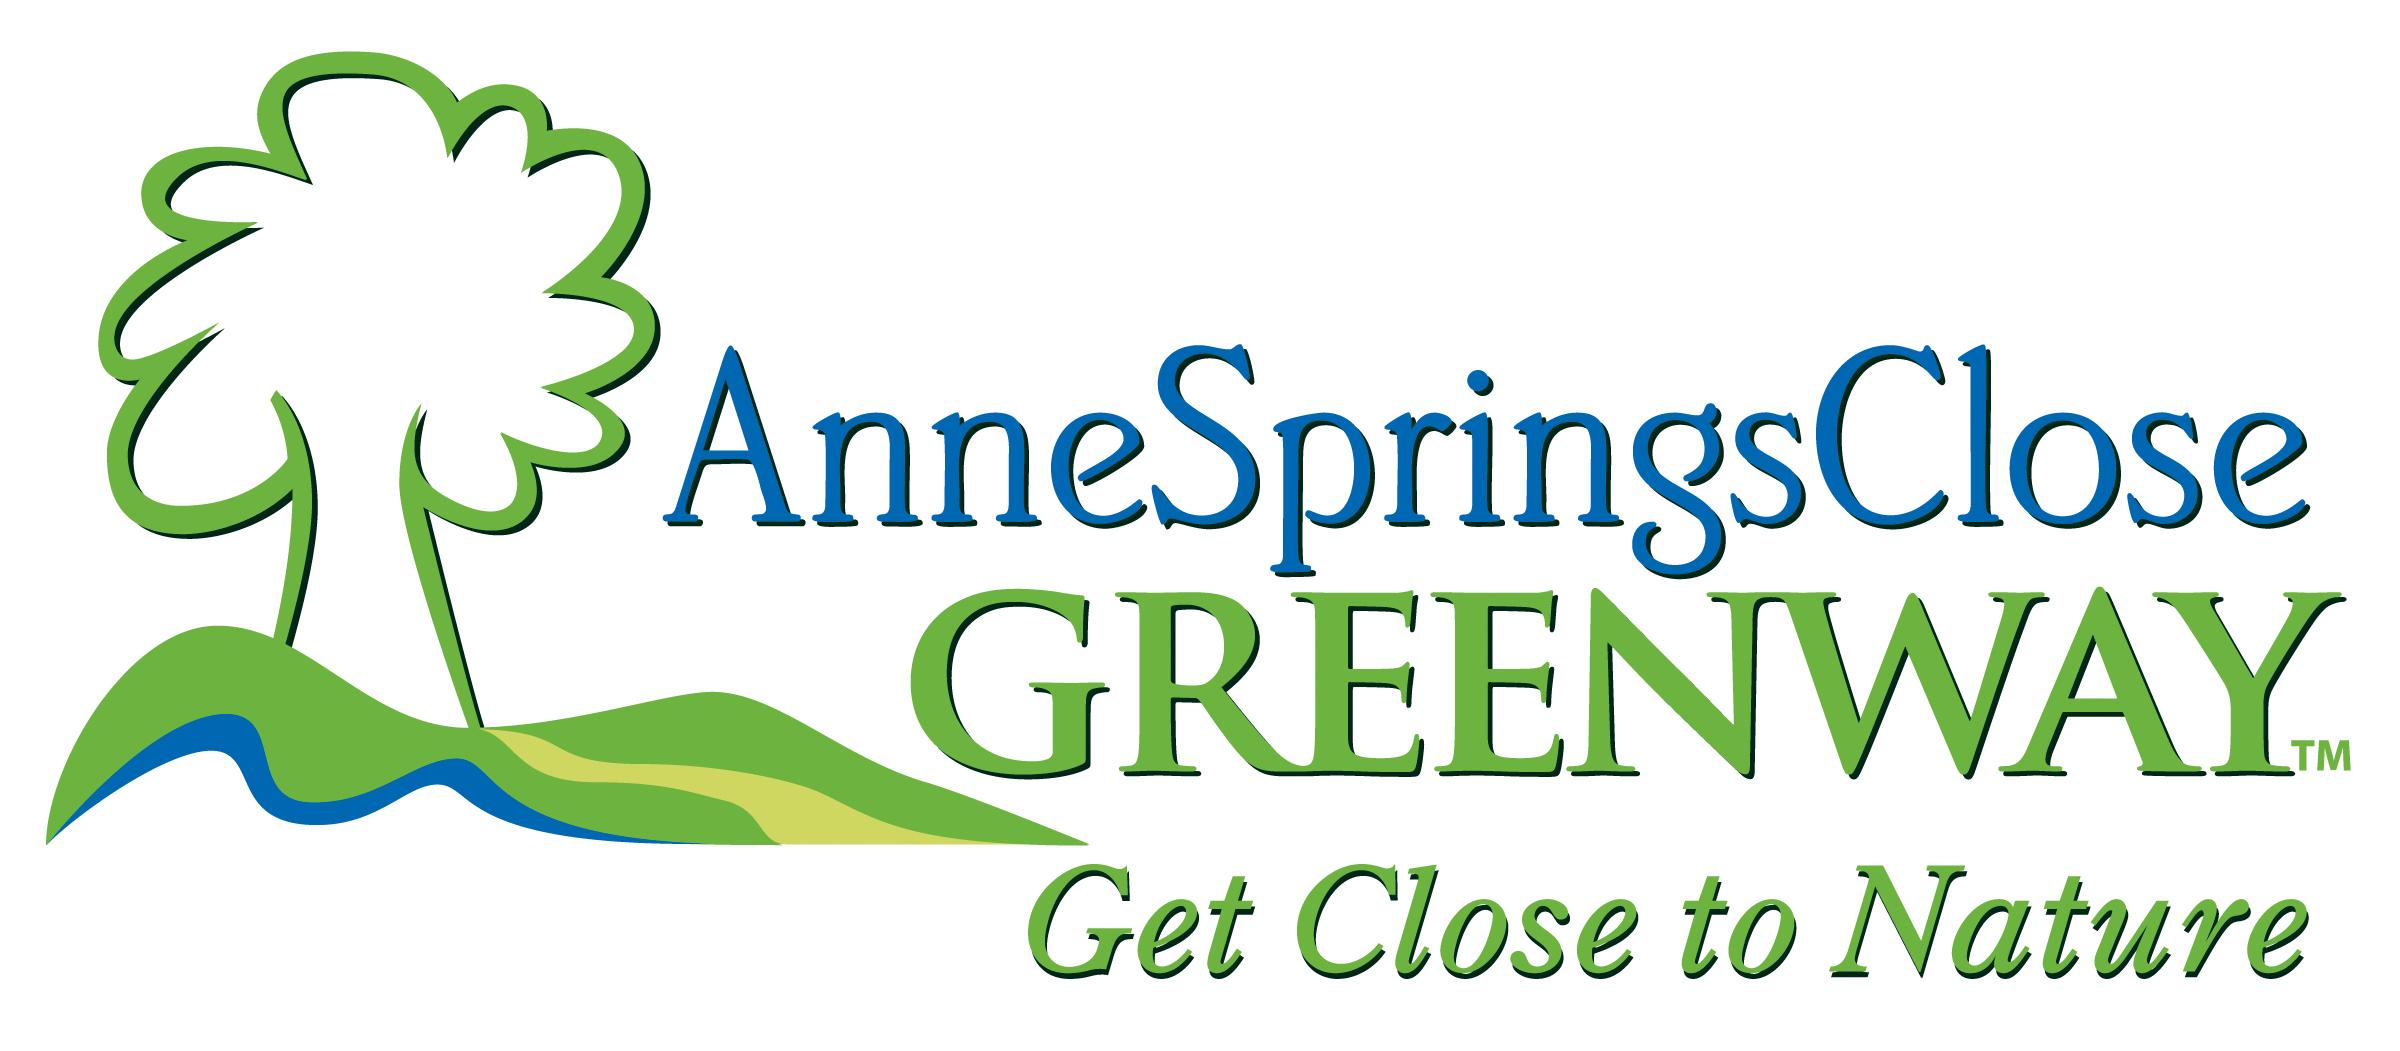 Anne Springs Close Greenway